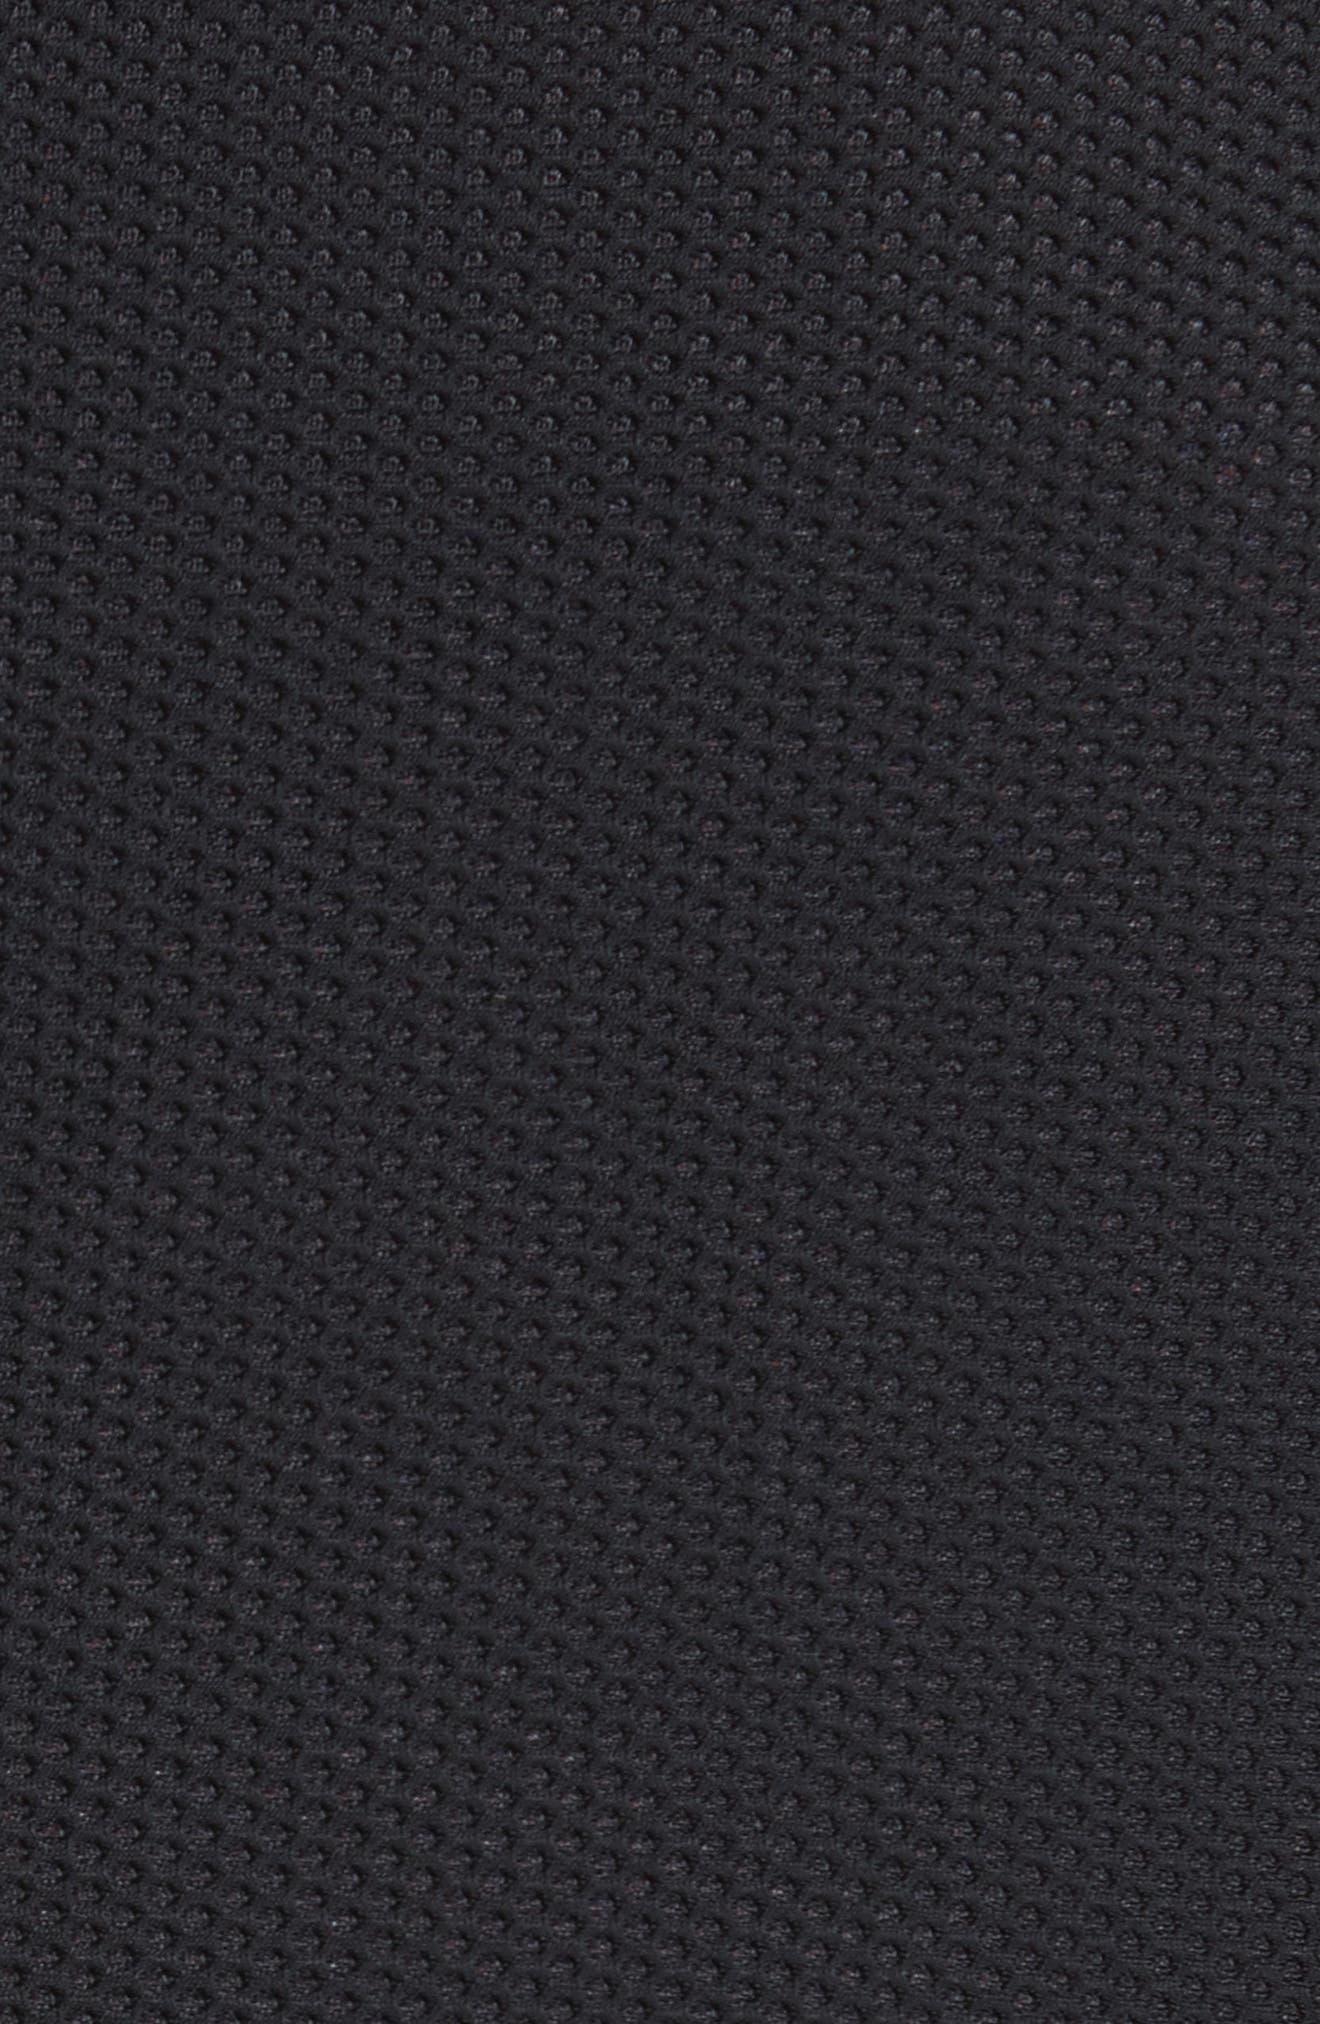 Regular Fit Stretch Blazer,                             Alternate thumbnail 6, color,                             004